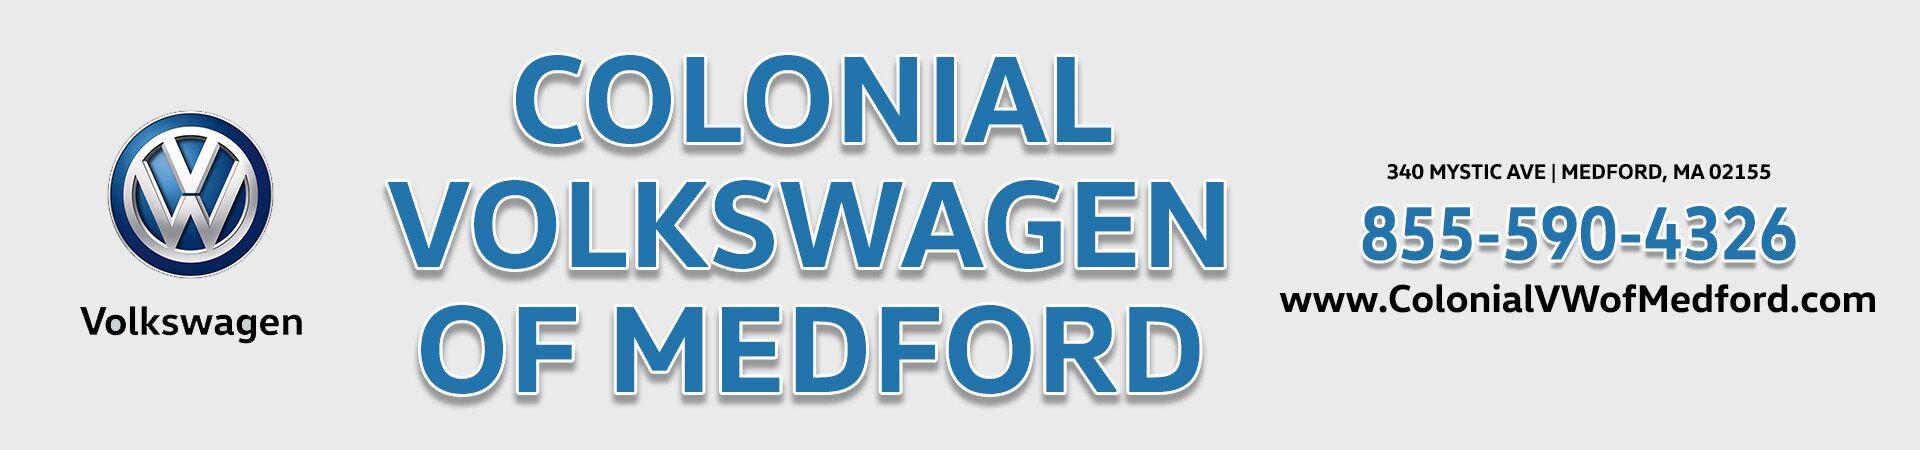 west medford online dating Normal boarding has resumed at west medford, wedgemere & winchester center stations.